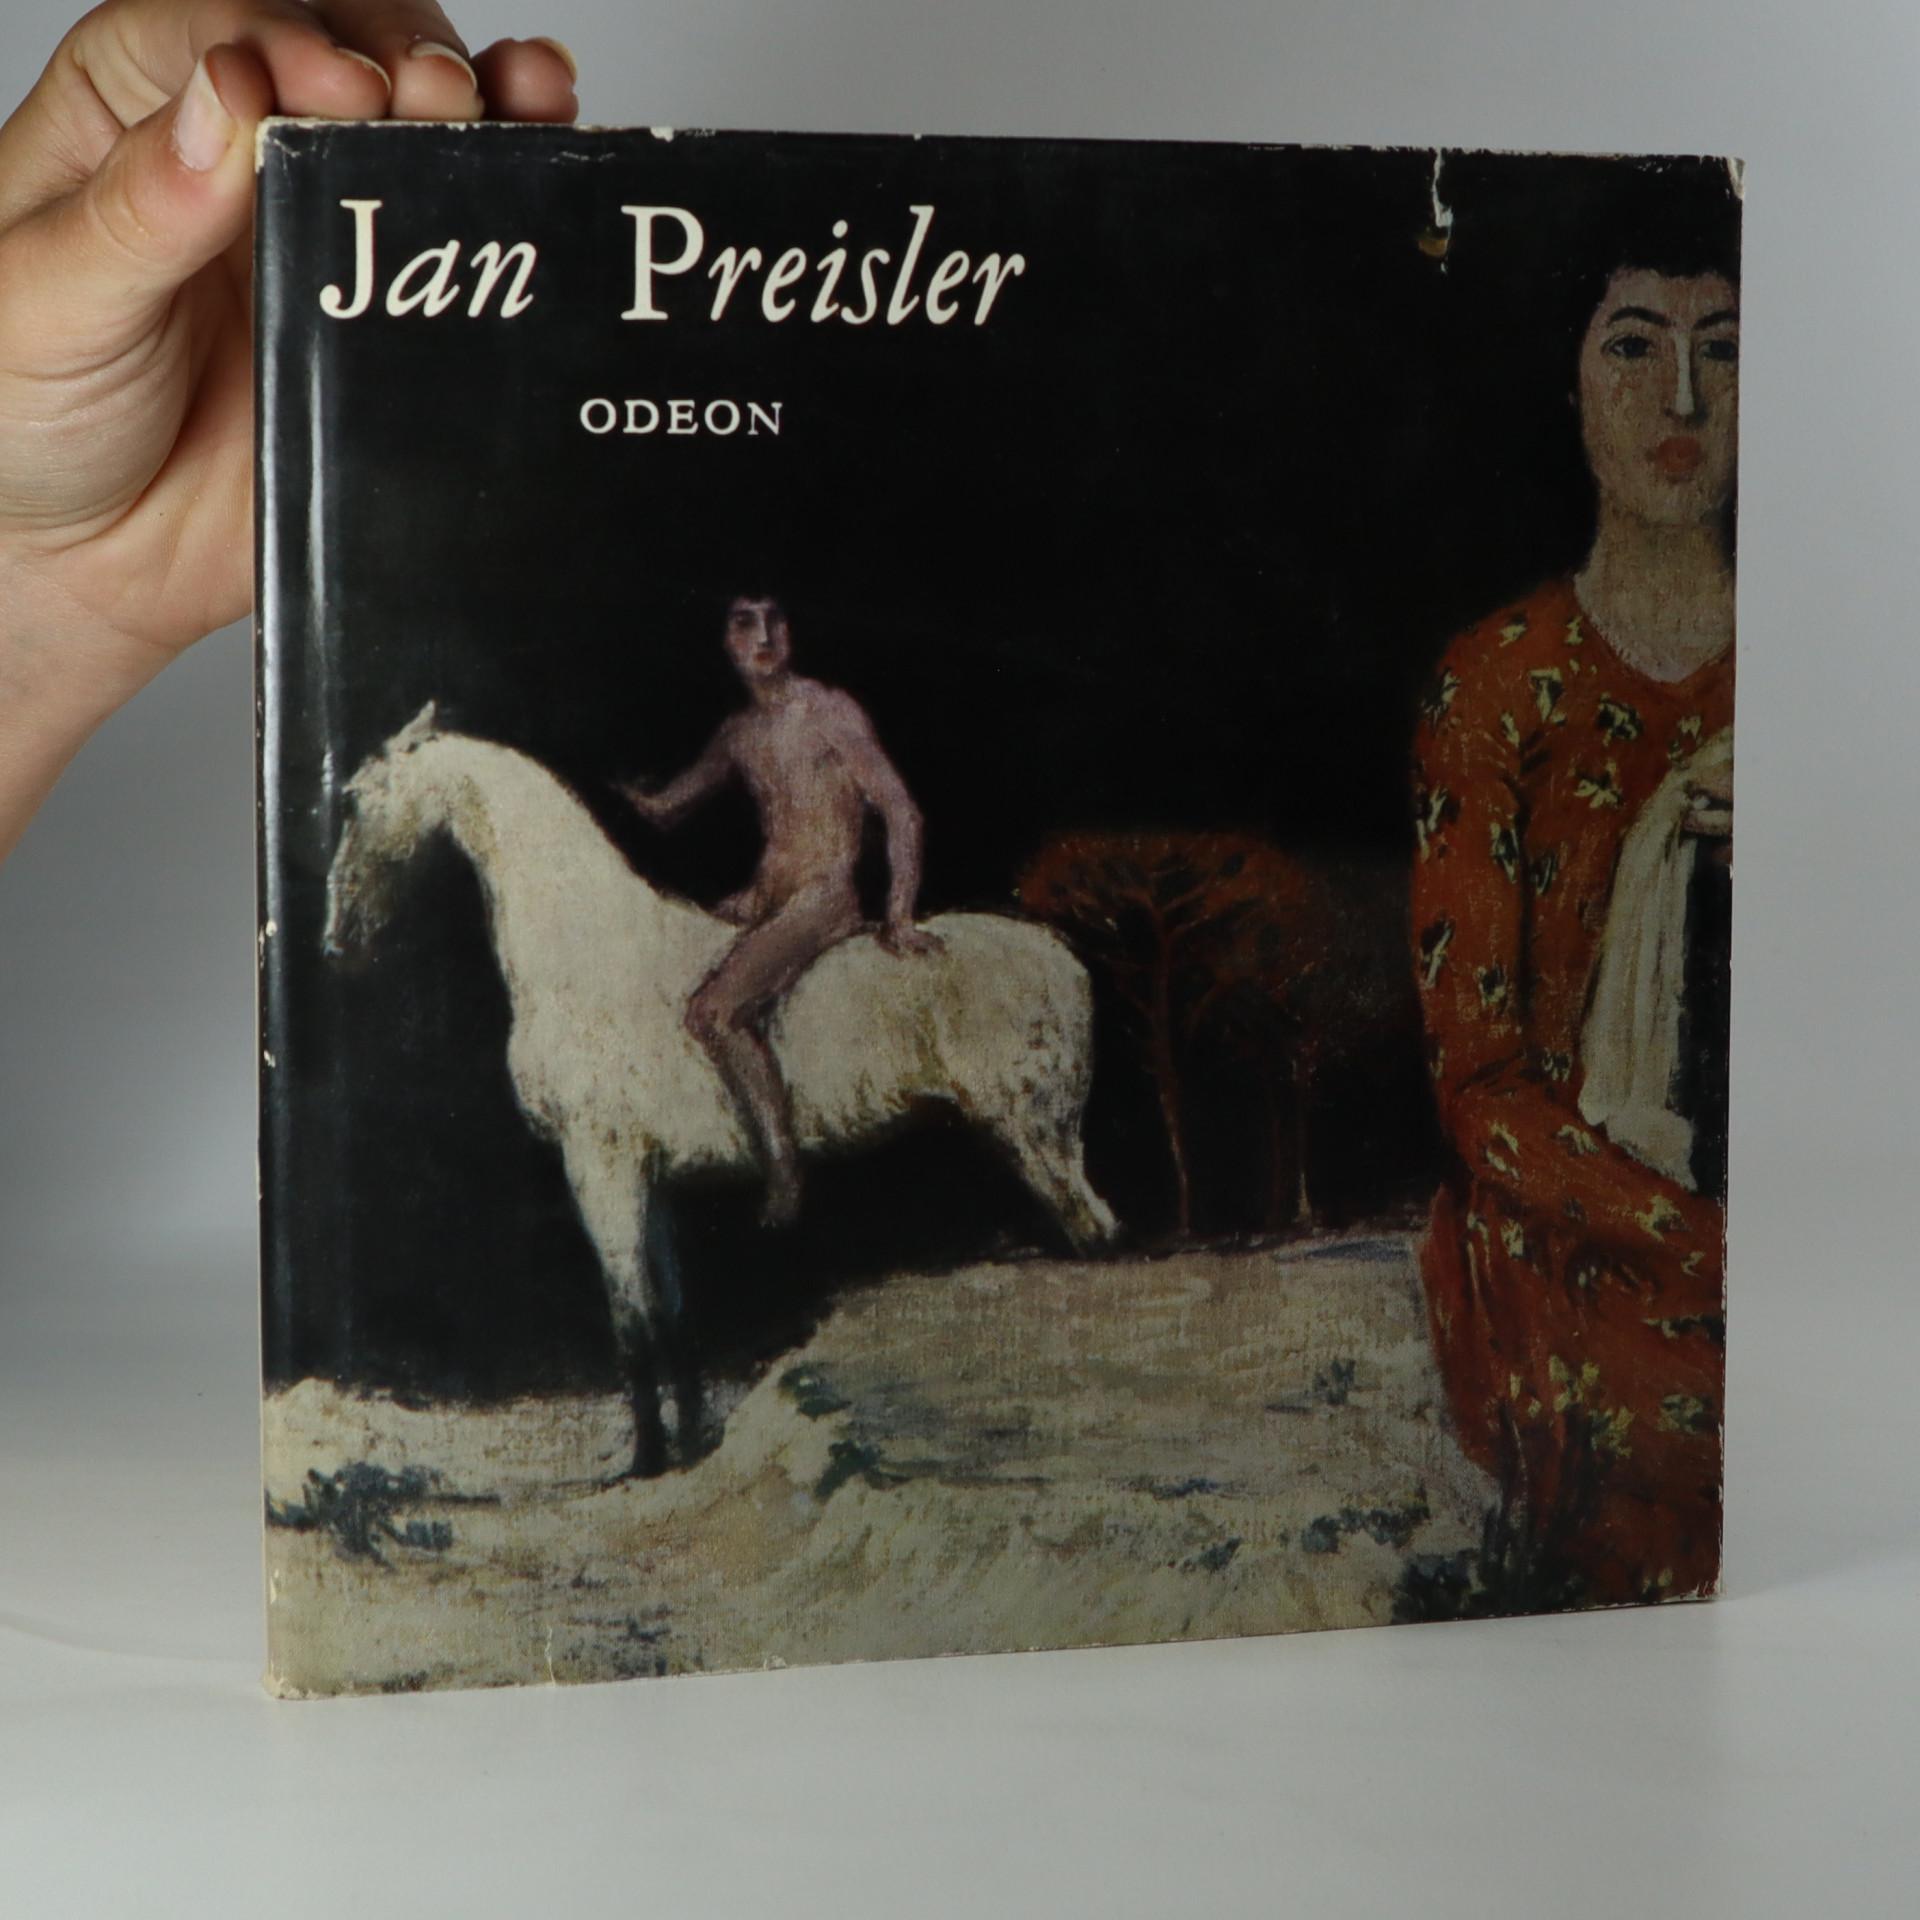 antikvární kniha Jan Preisler, 1968